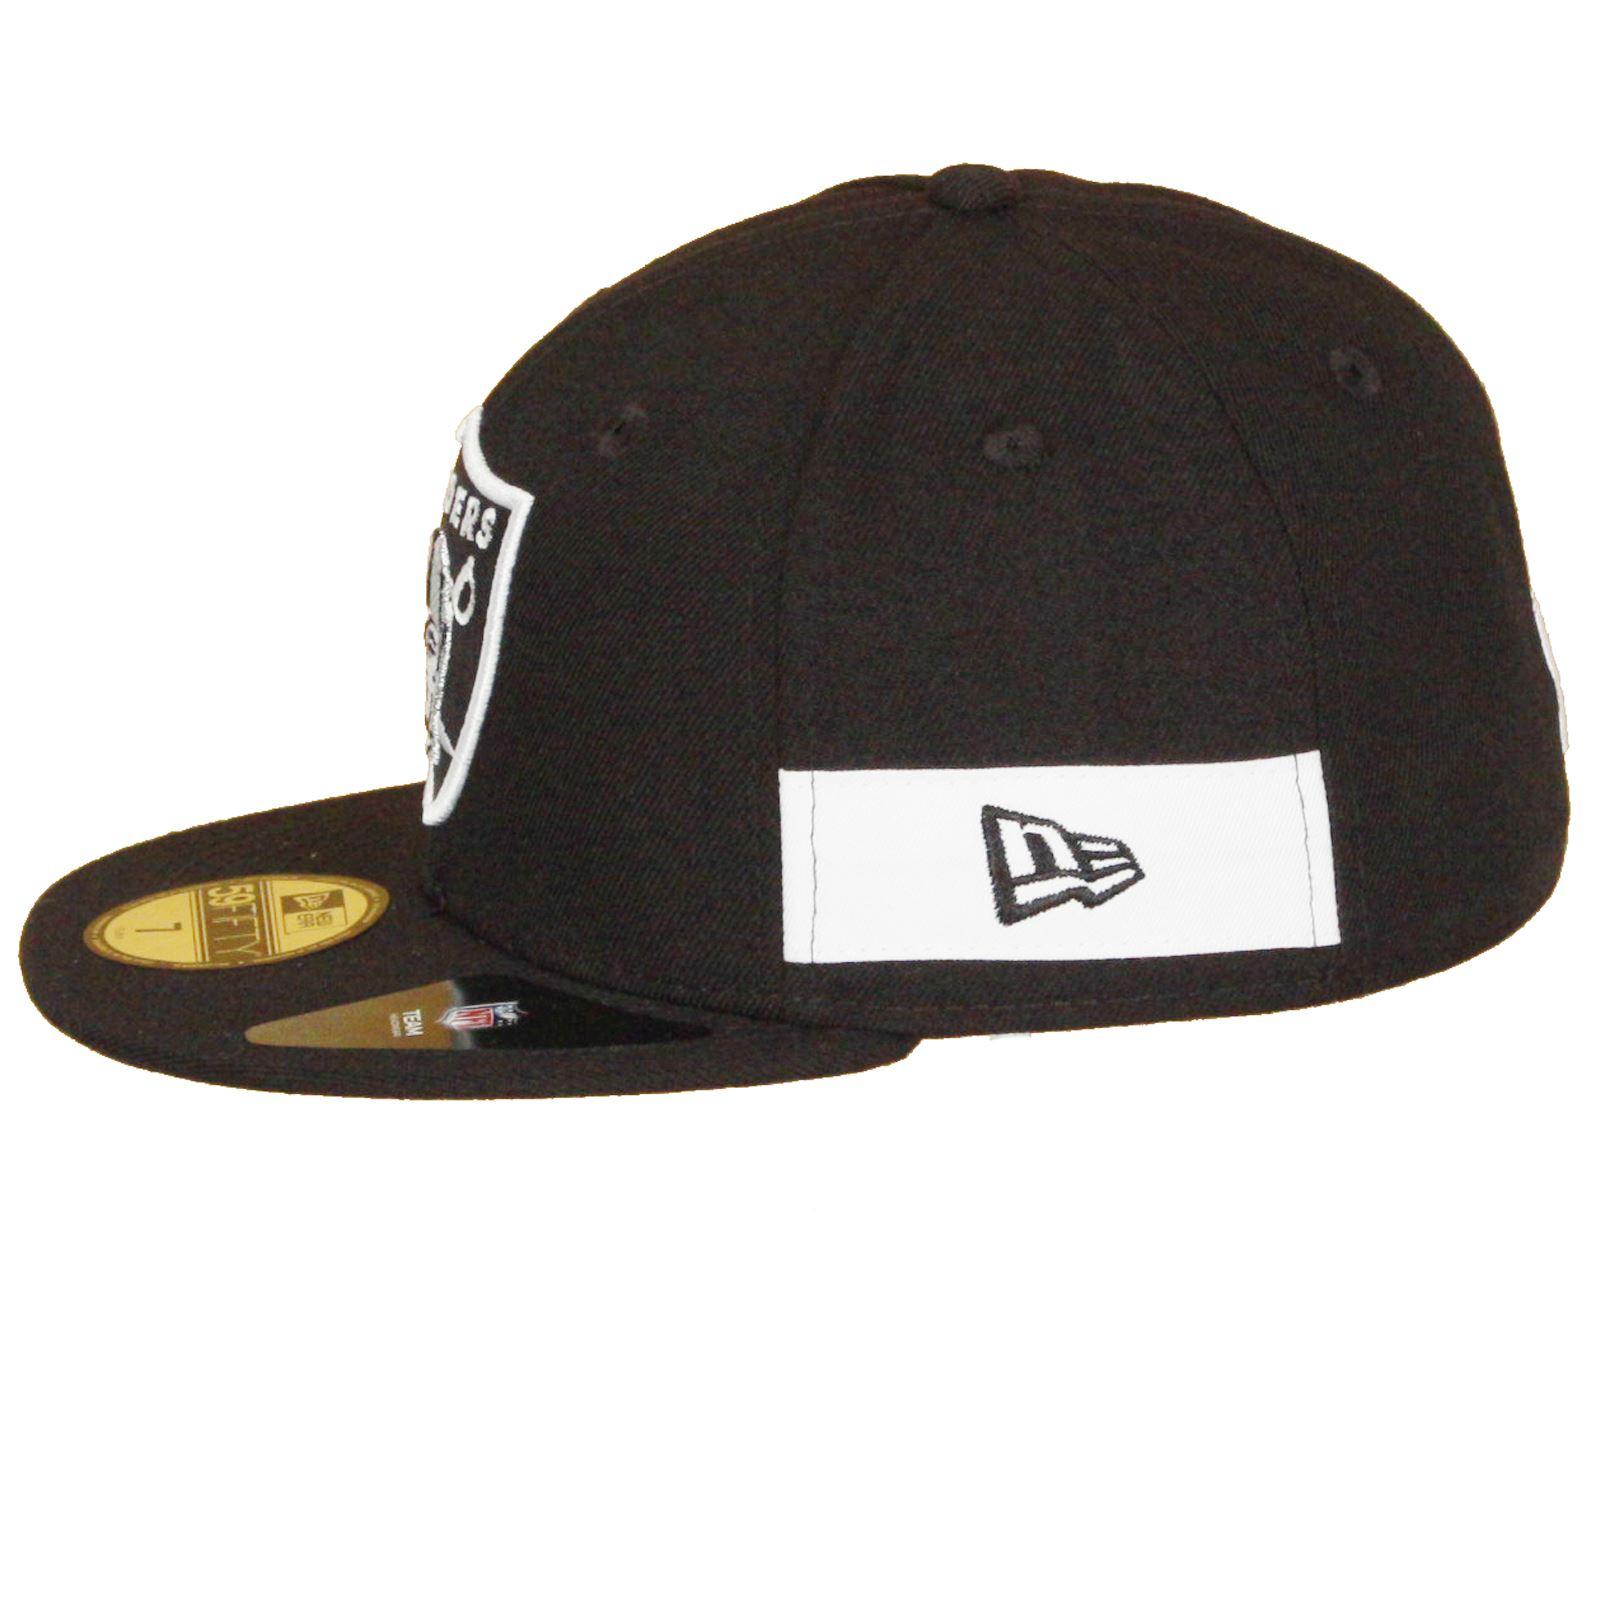 New Era Side Block Fitted 59Fifty Flatbill cap ~ Oakland Raiders